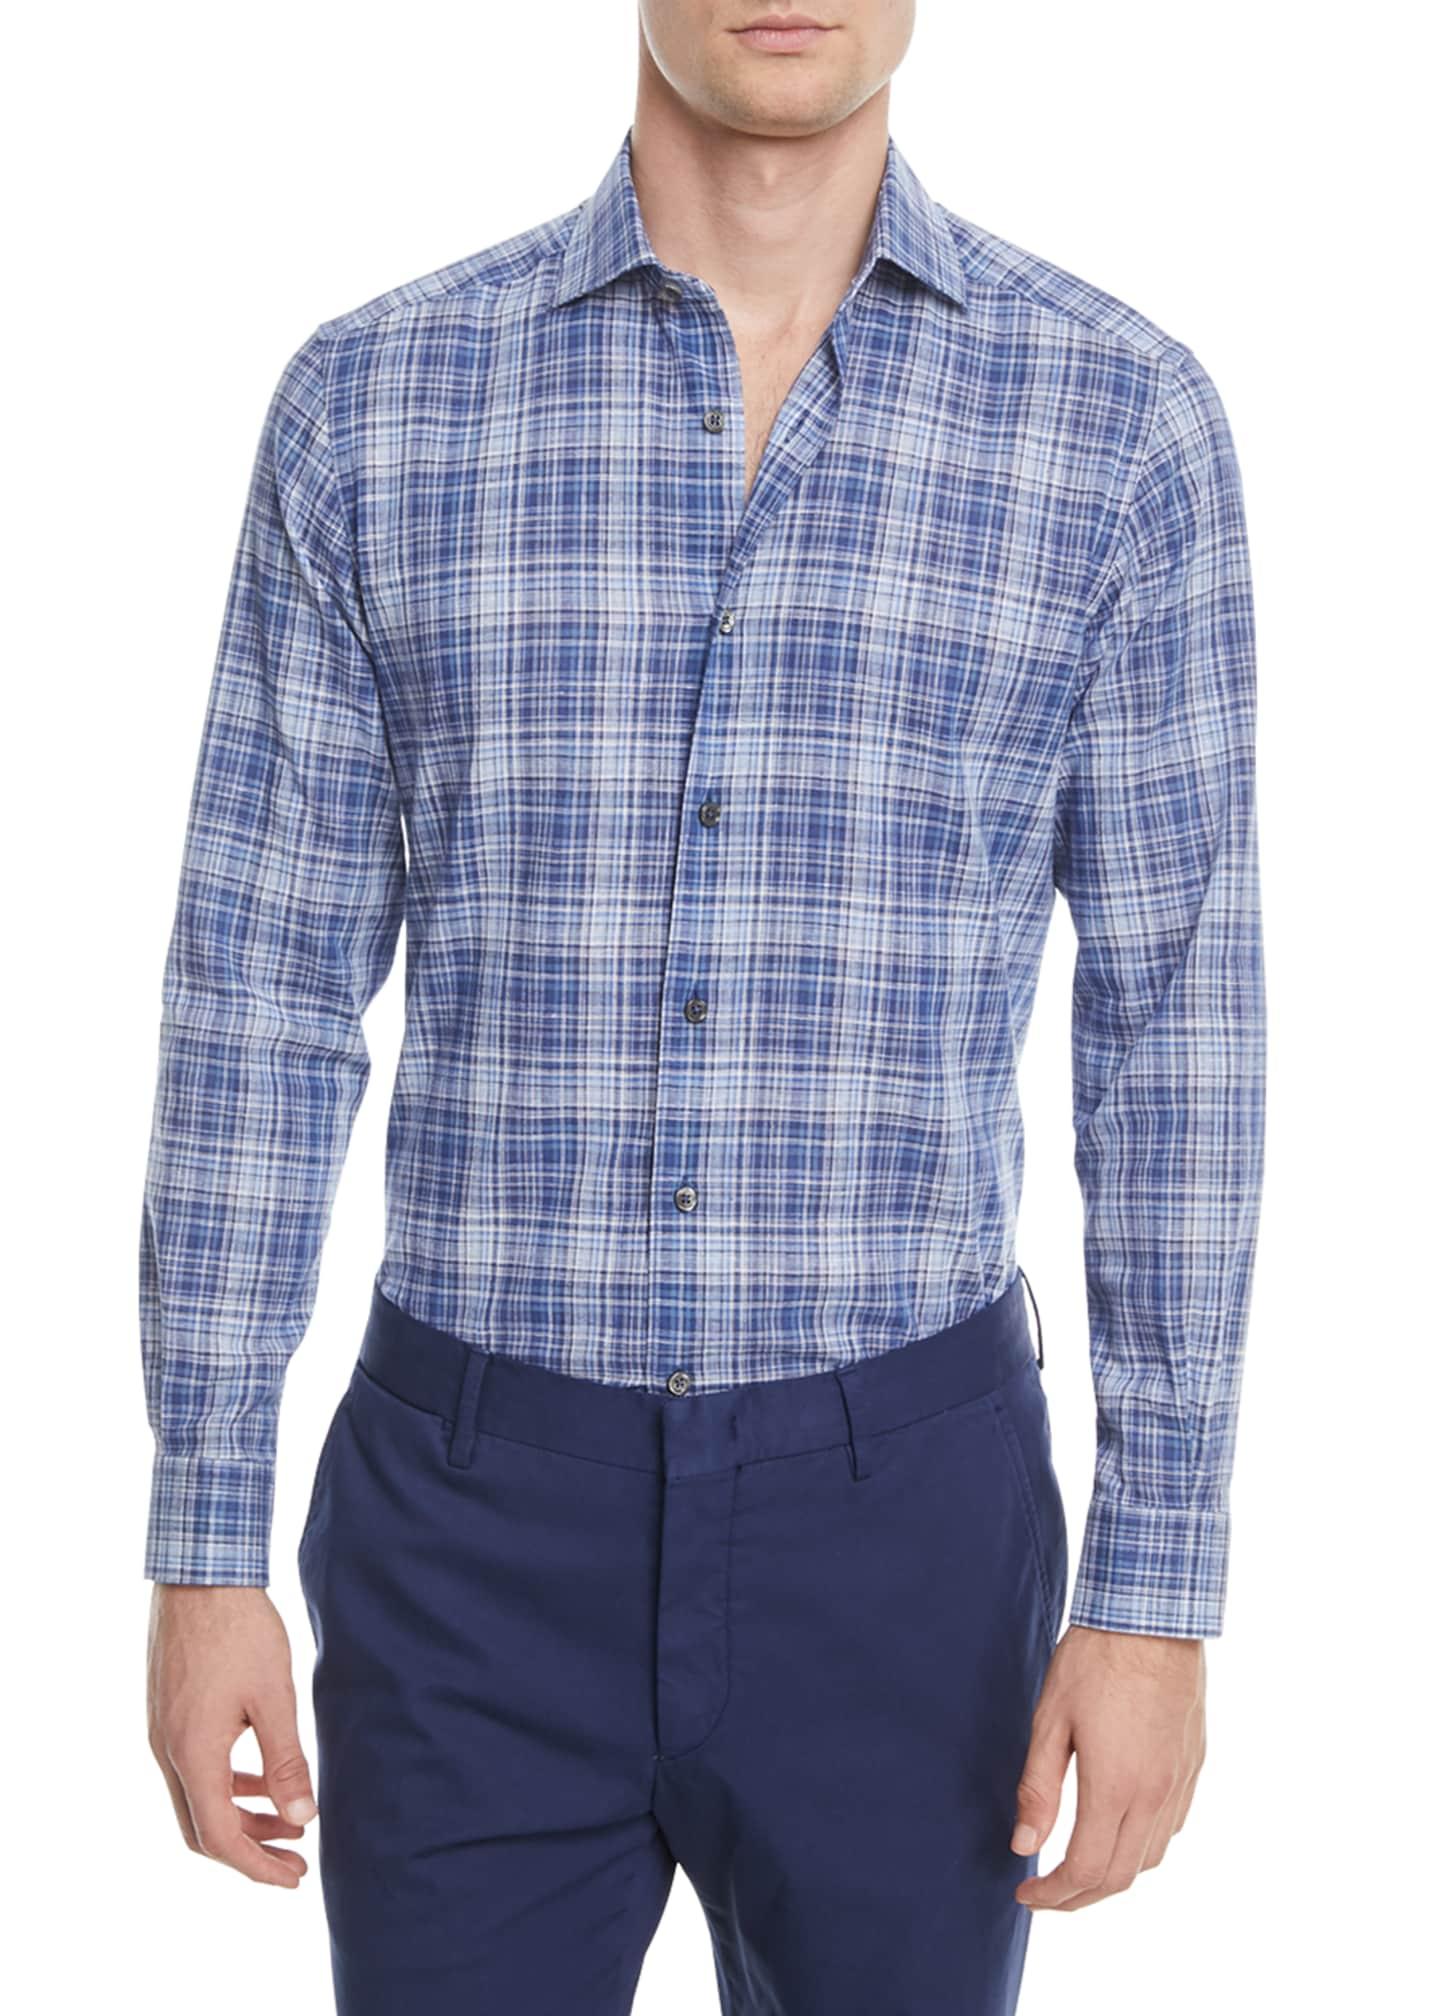 Ermenegildo Zegna Linen-Blend Plaid Sport Shirt